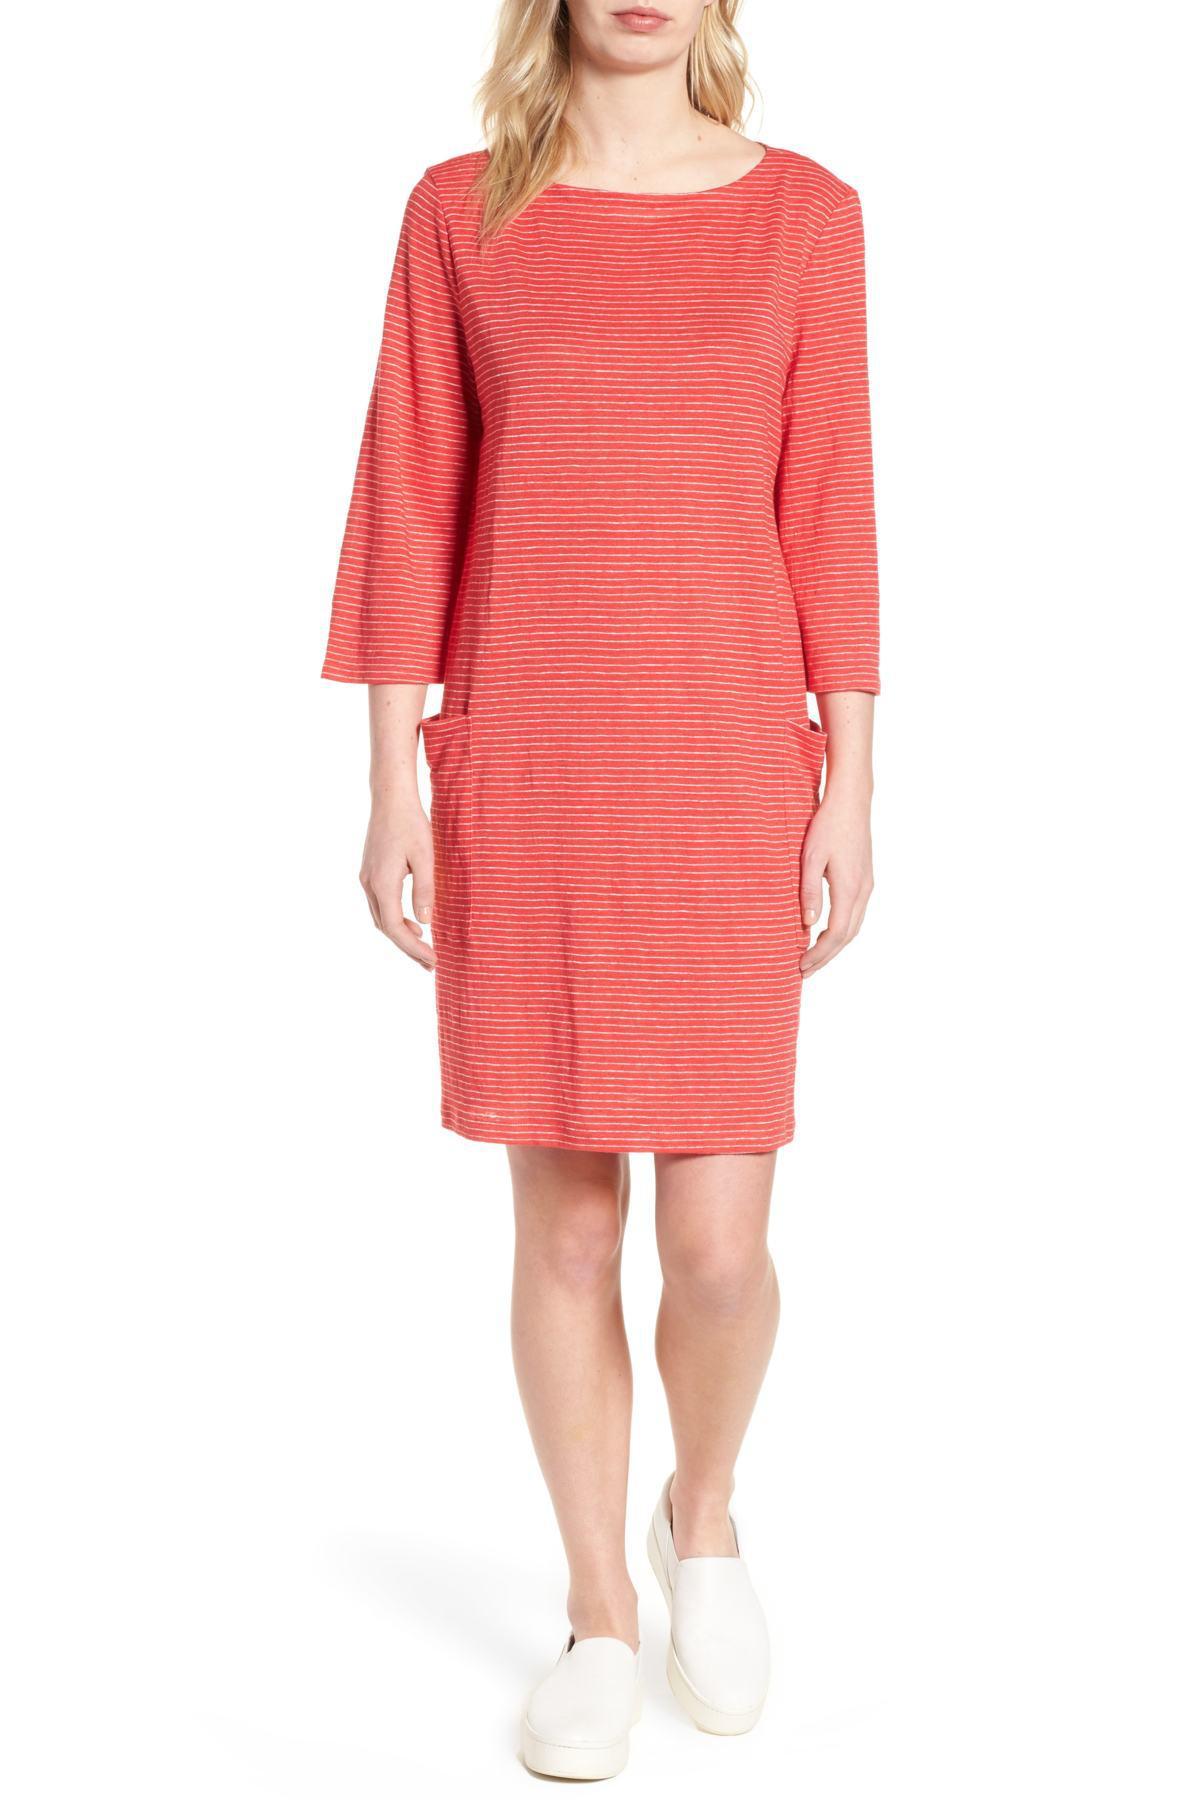 dfb4d180bc Lyst - Eileen Fisher Bateau Nk K l Dress in Pink